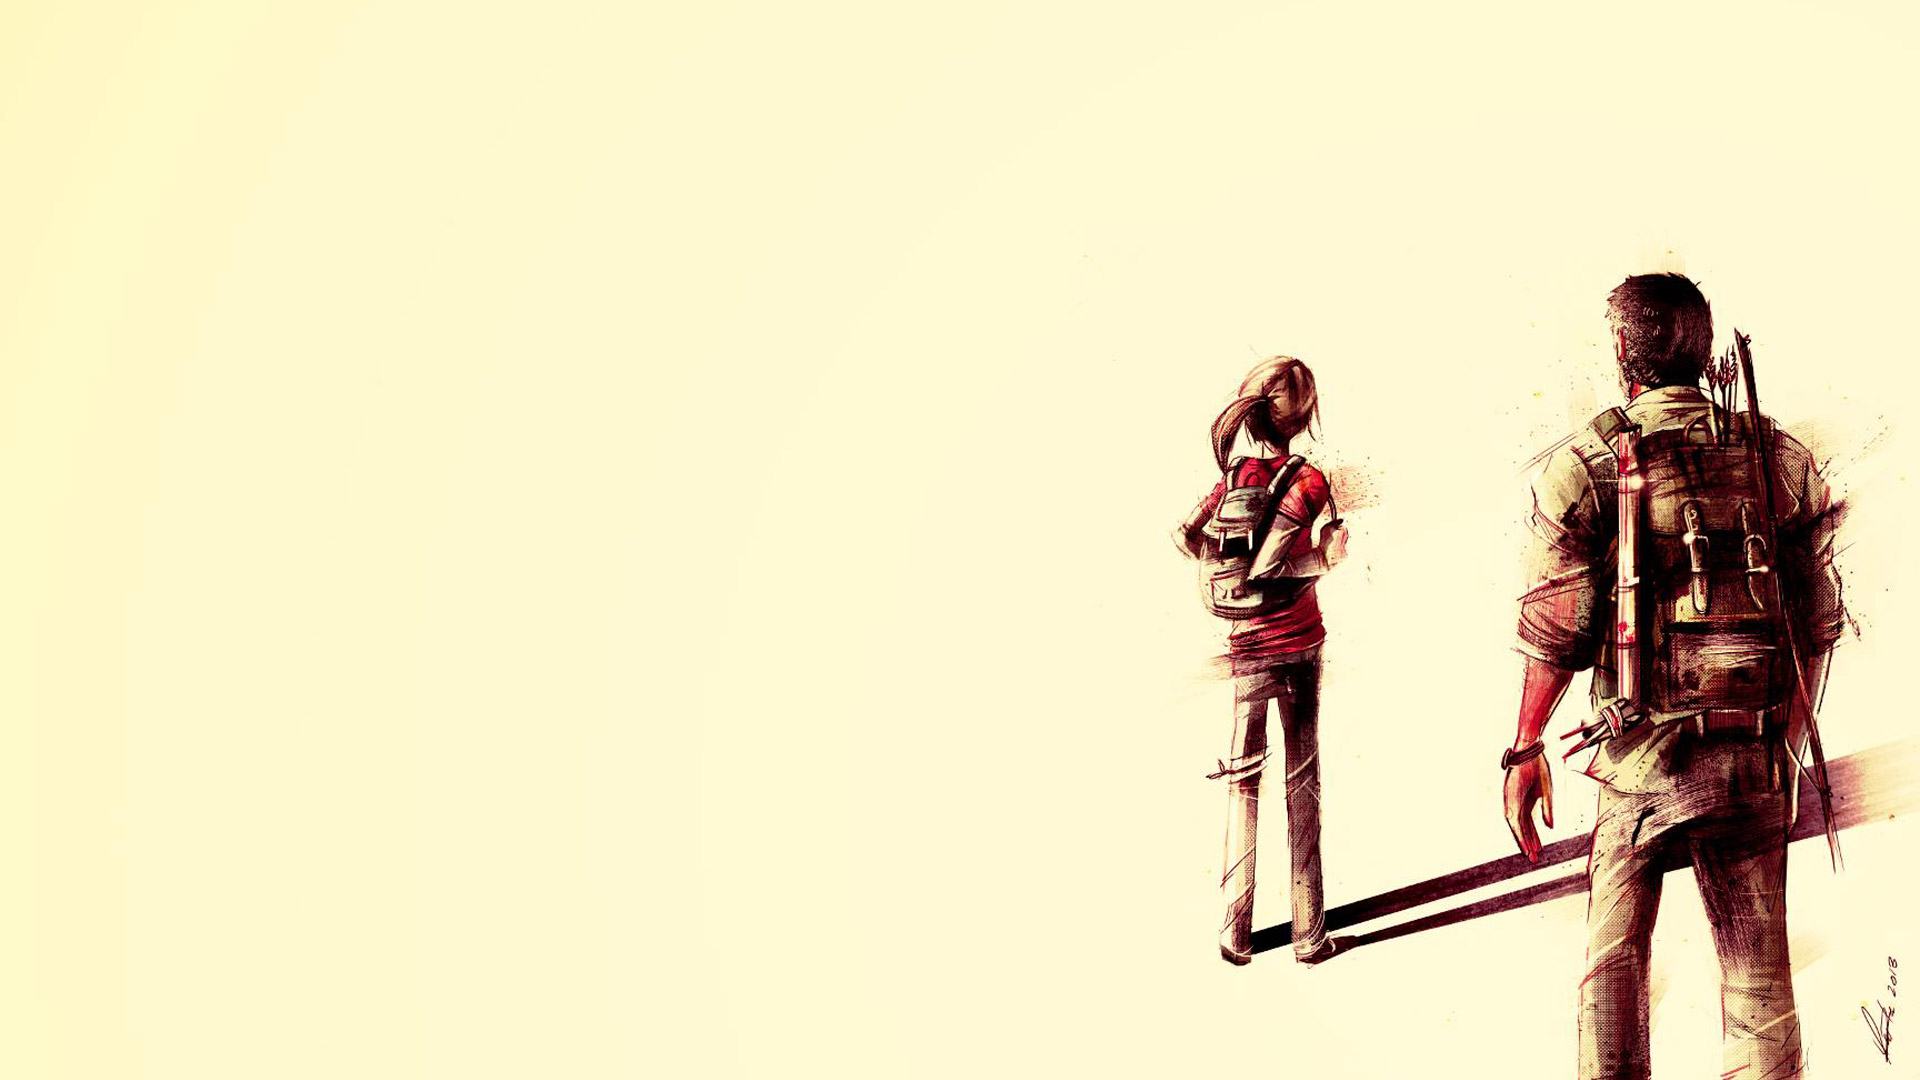 The Last Of Us Hd Wallpaper - Last Of Us Wallpaper Theme , HD Wallpaper & Backgrounds